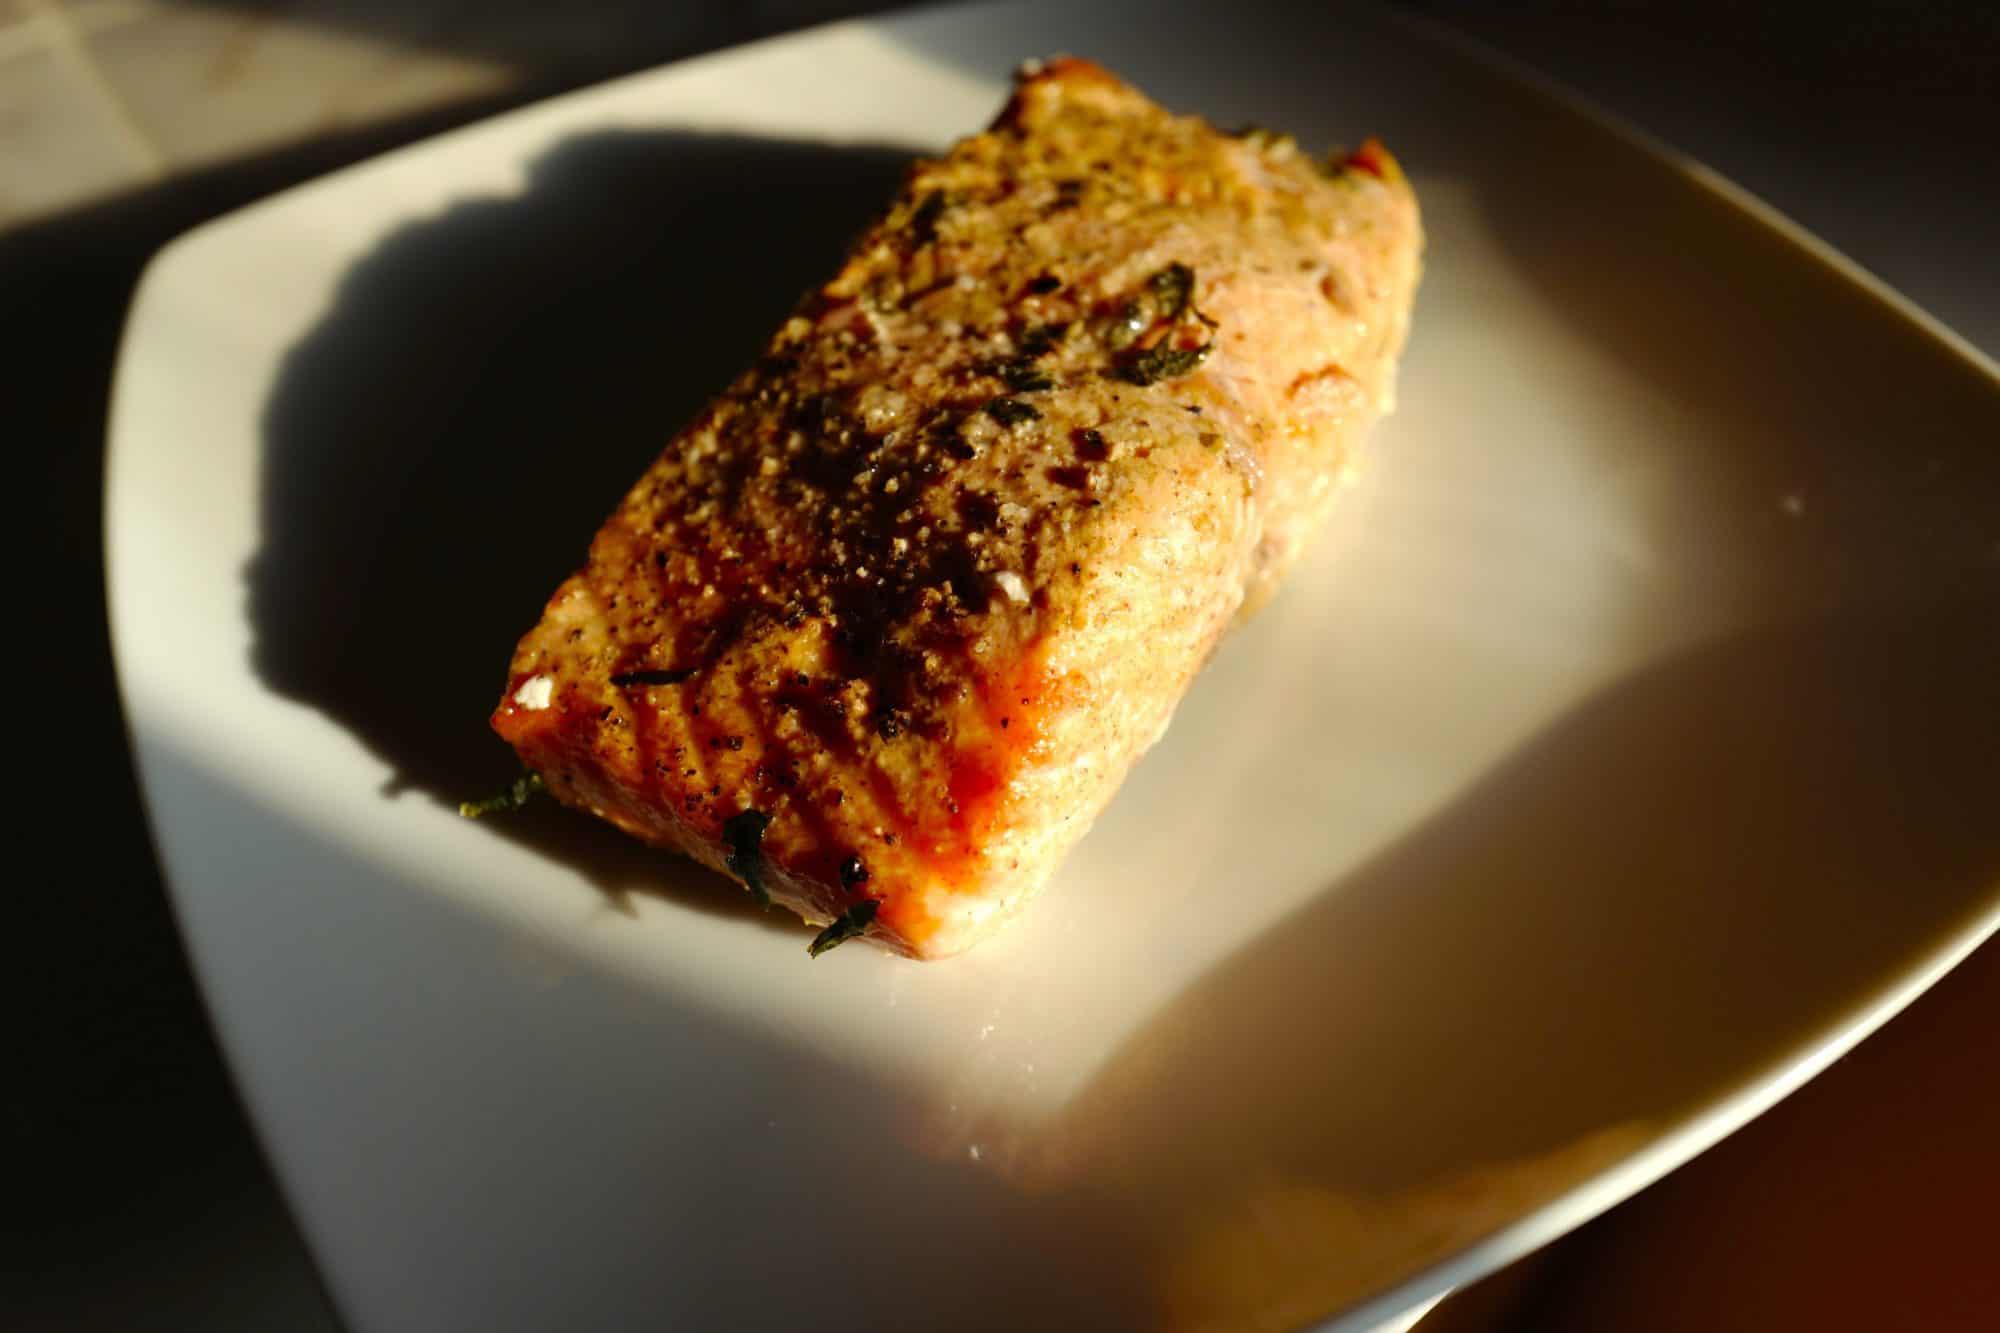 Atlantic salmon roasted in savory glaze by Foodjoya